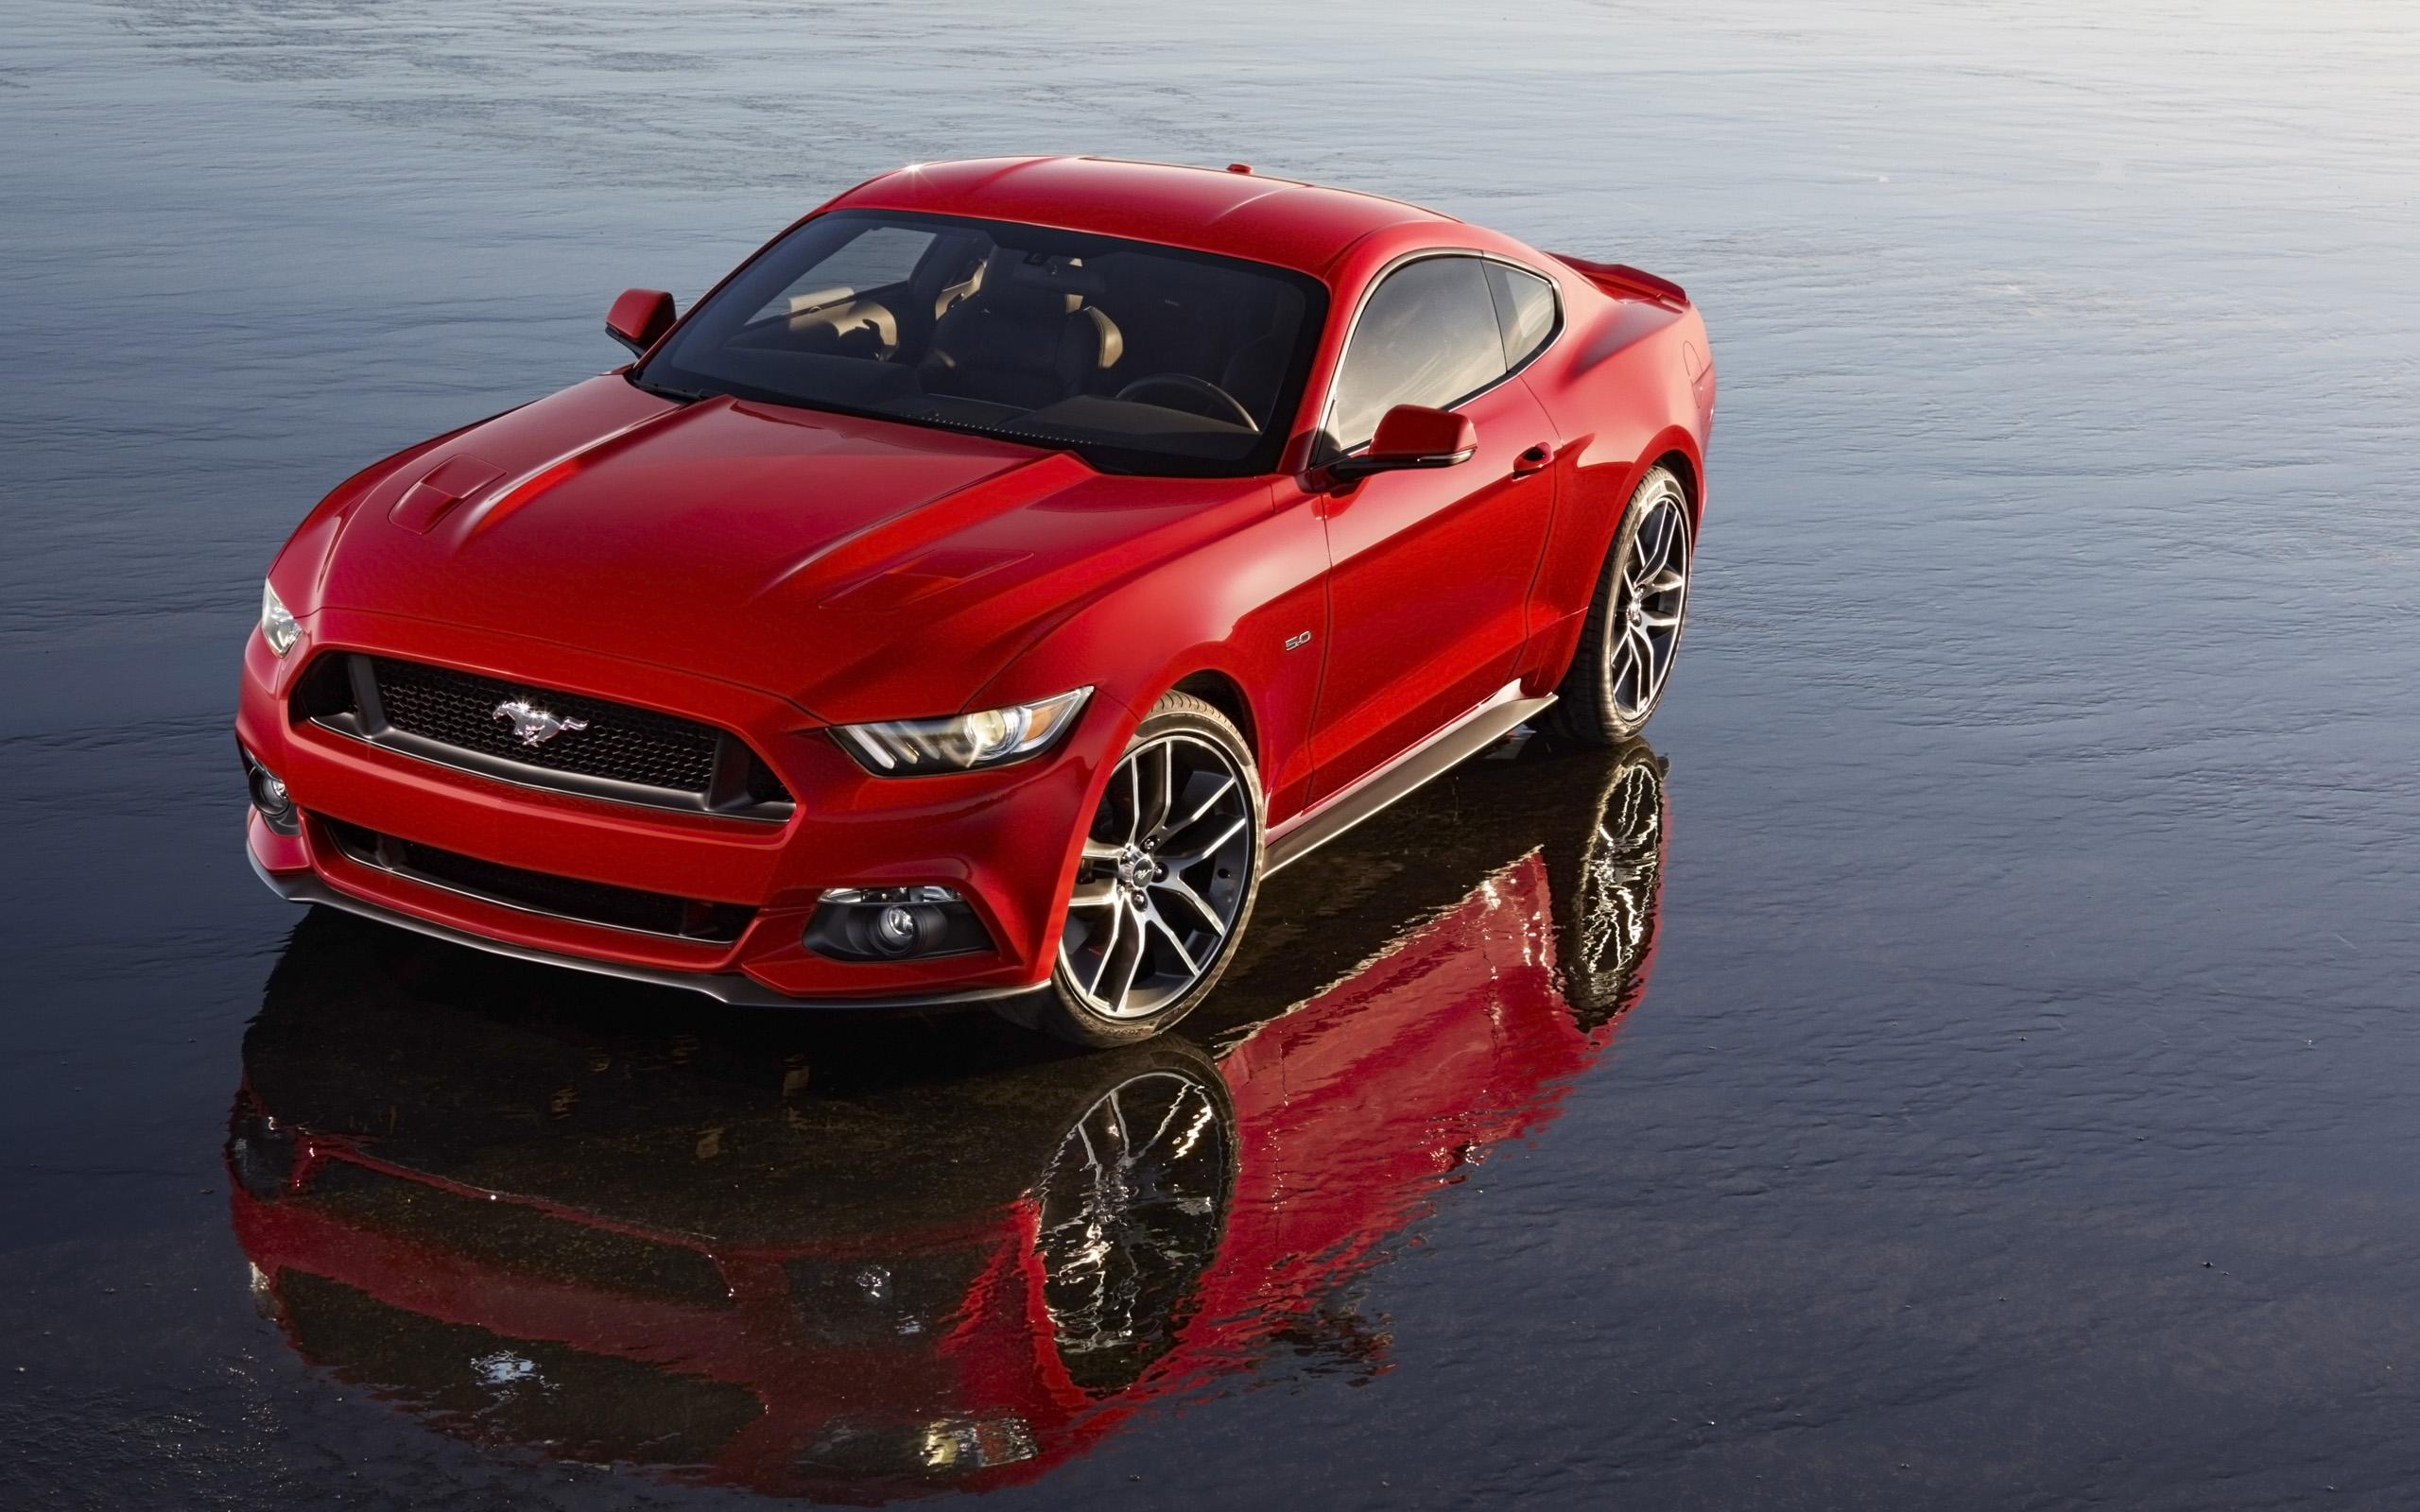 2015 Ford Mustang Wallpaper HD Car Wallpapers 2560x1600